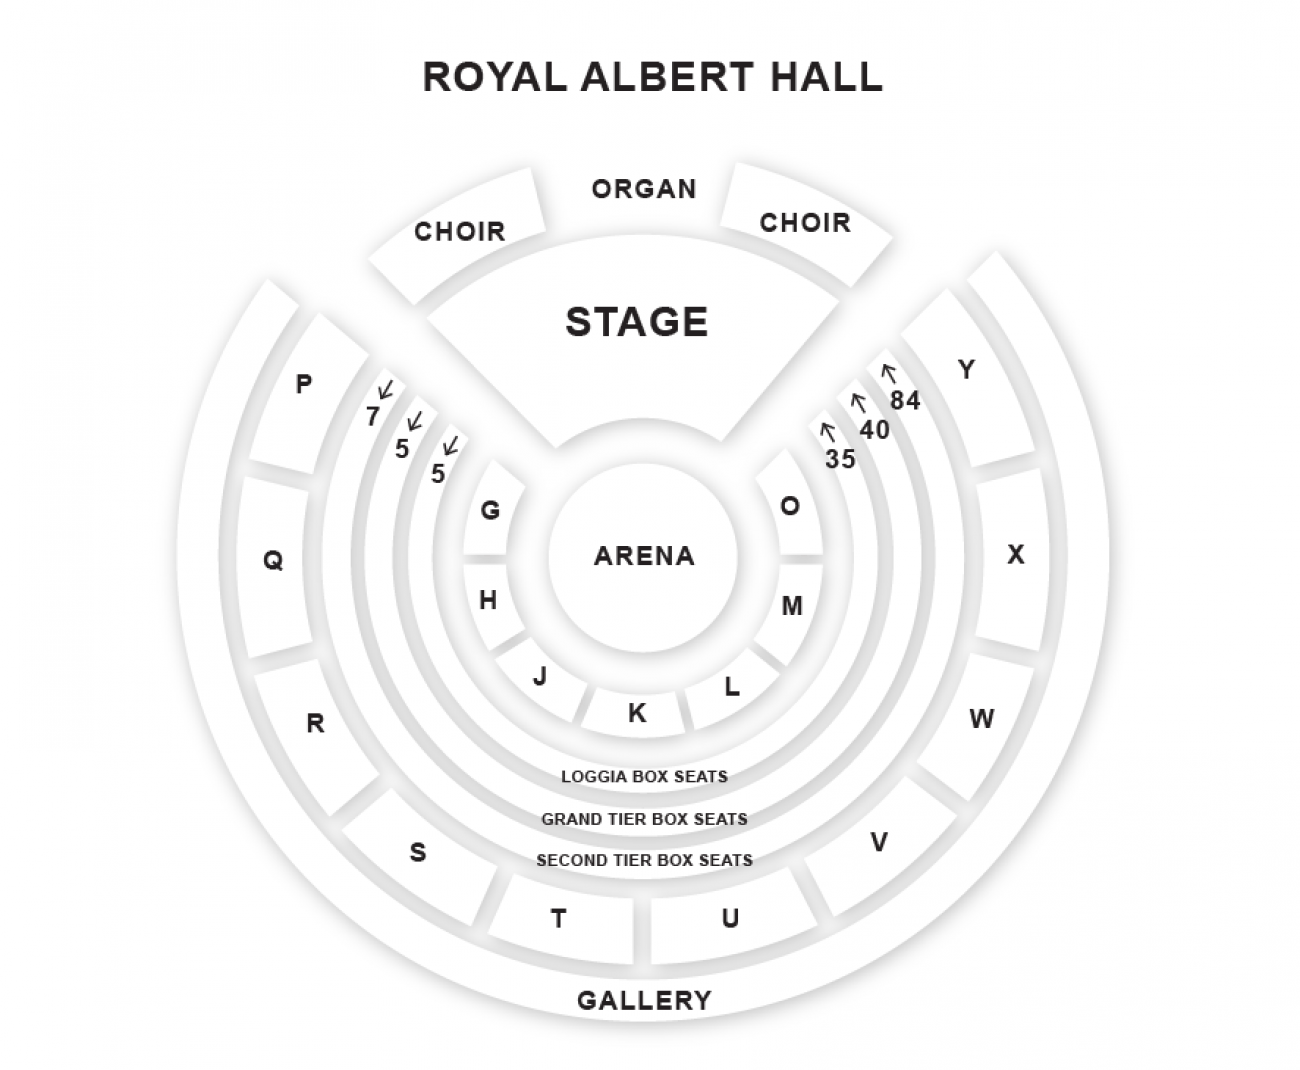 Royal Albert Hall - Plan de Salle